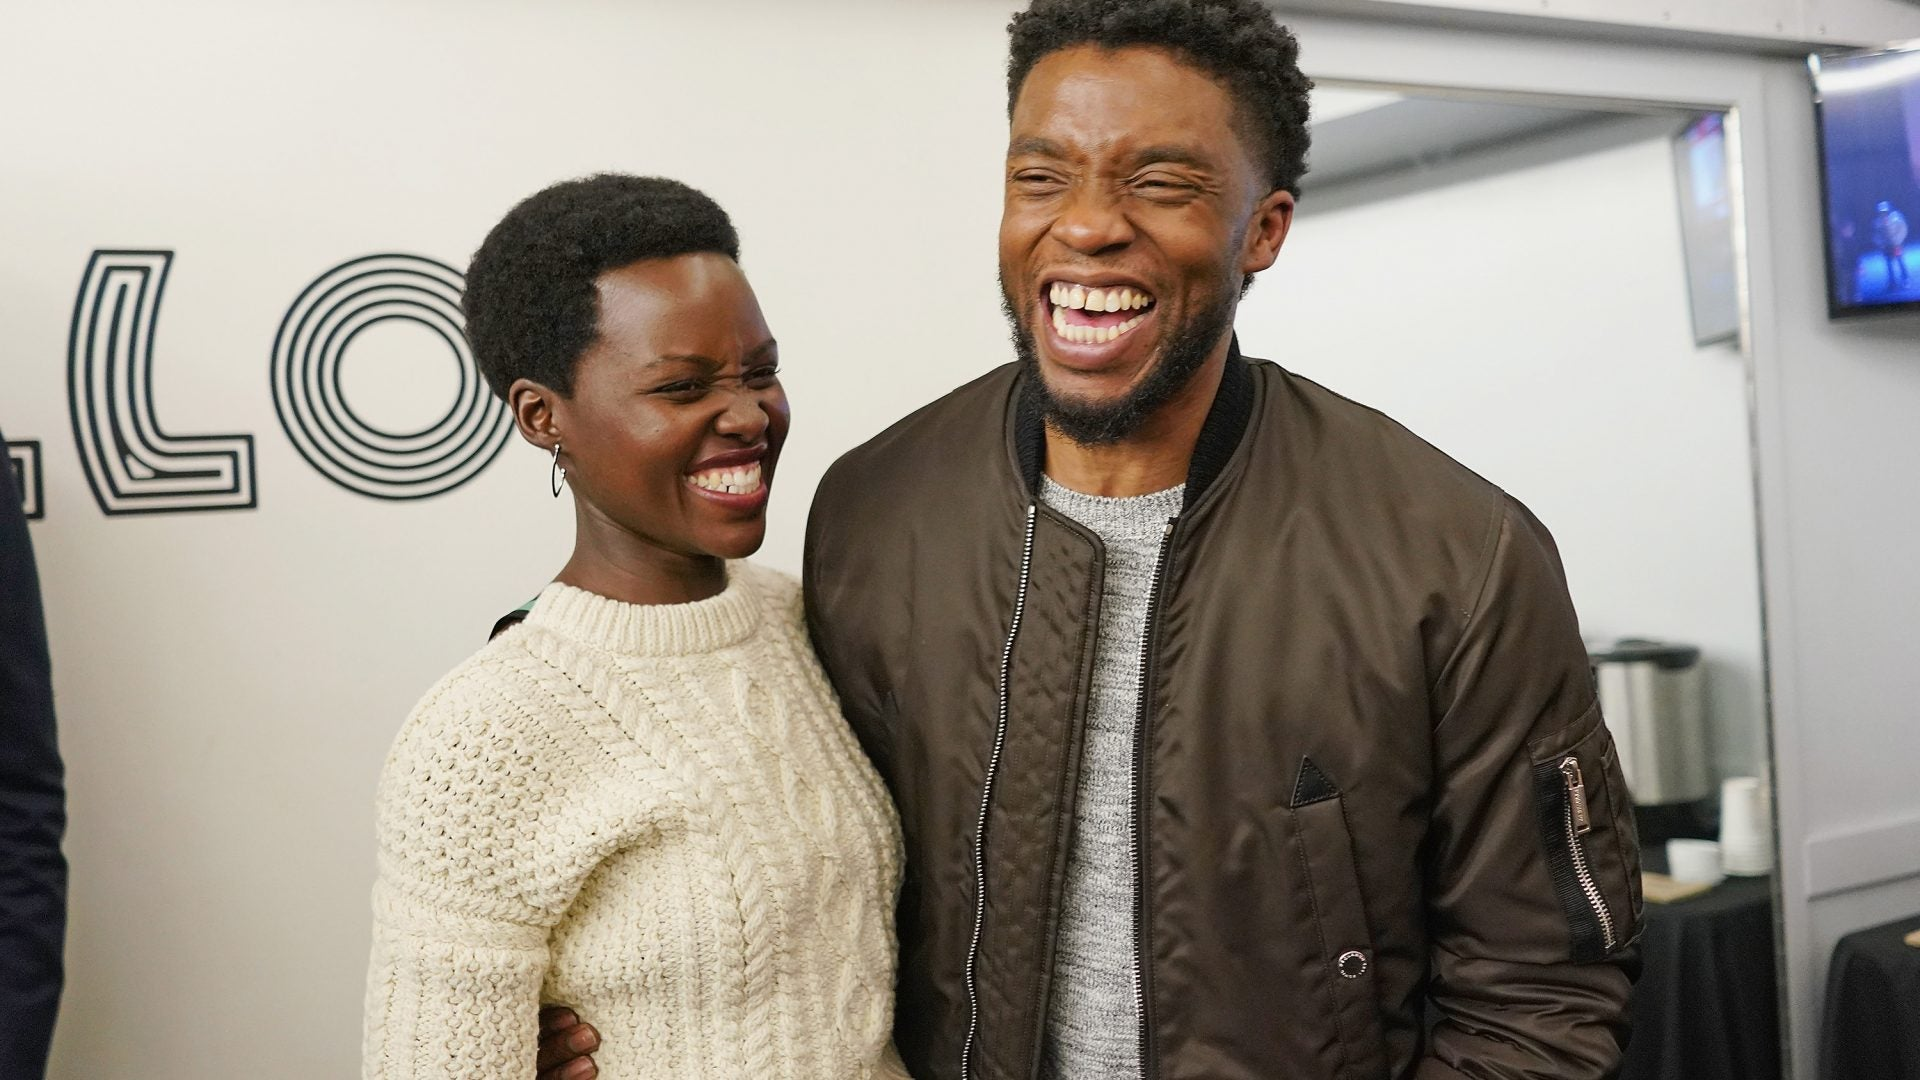 Lupita Nyong'o Describes Loss Of Chadwick Boseman As 'A Punch To The Gut'